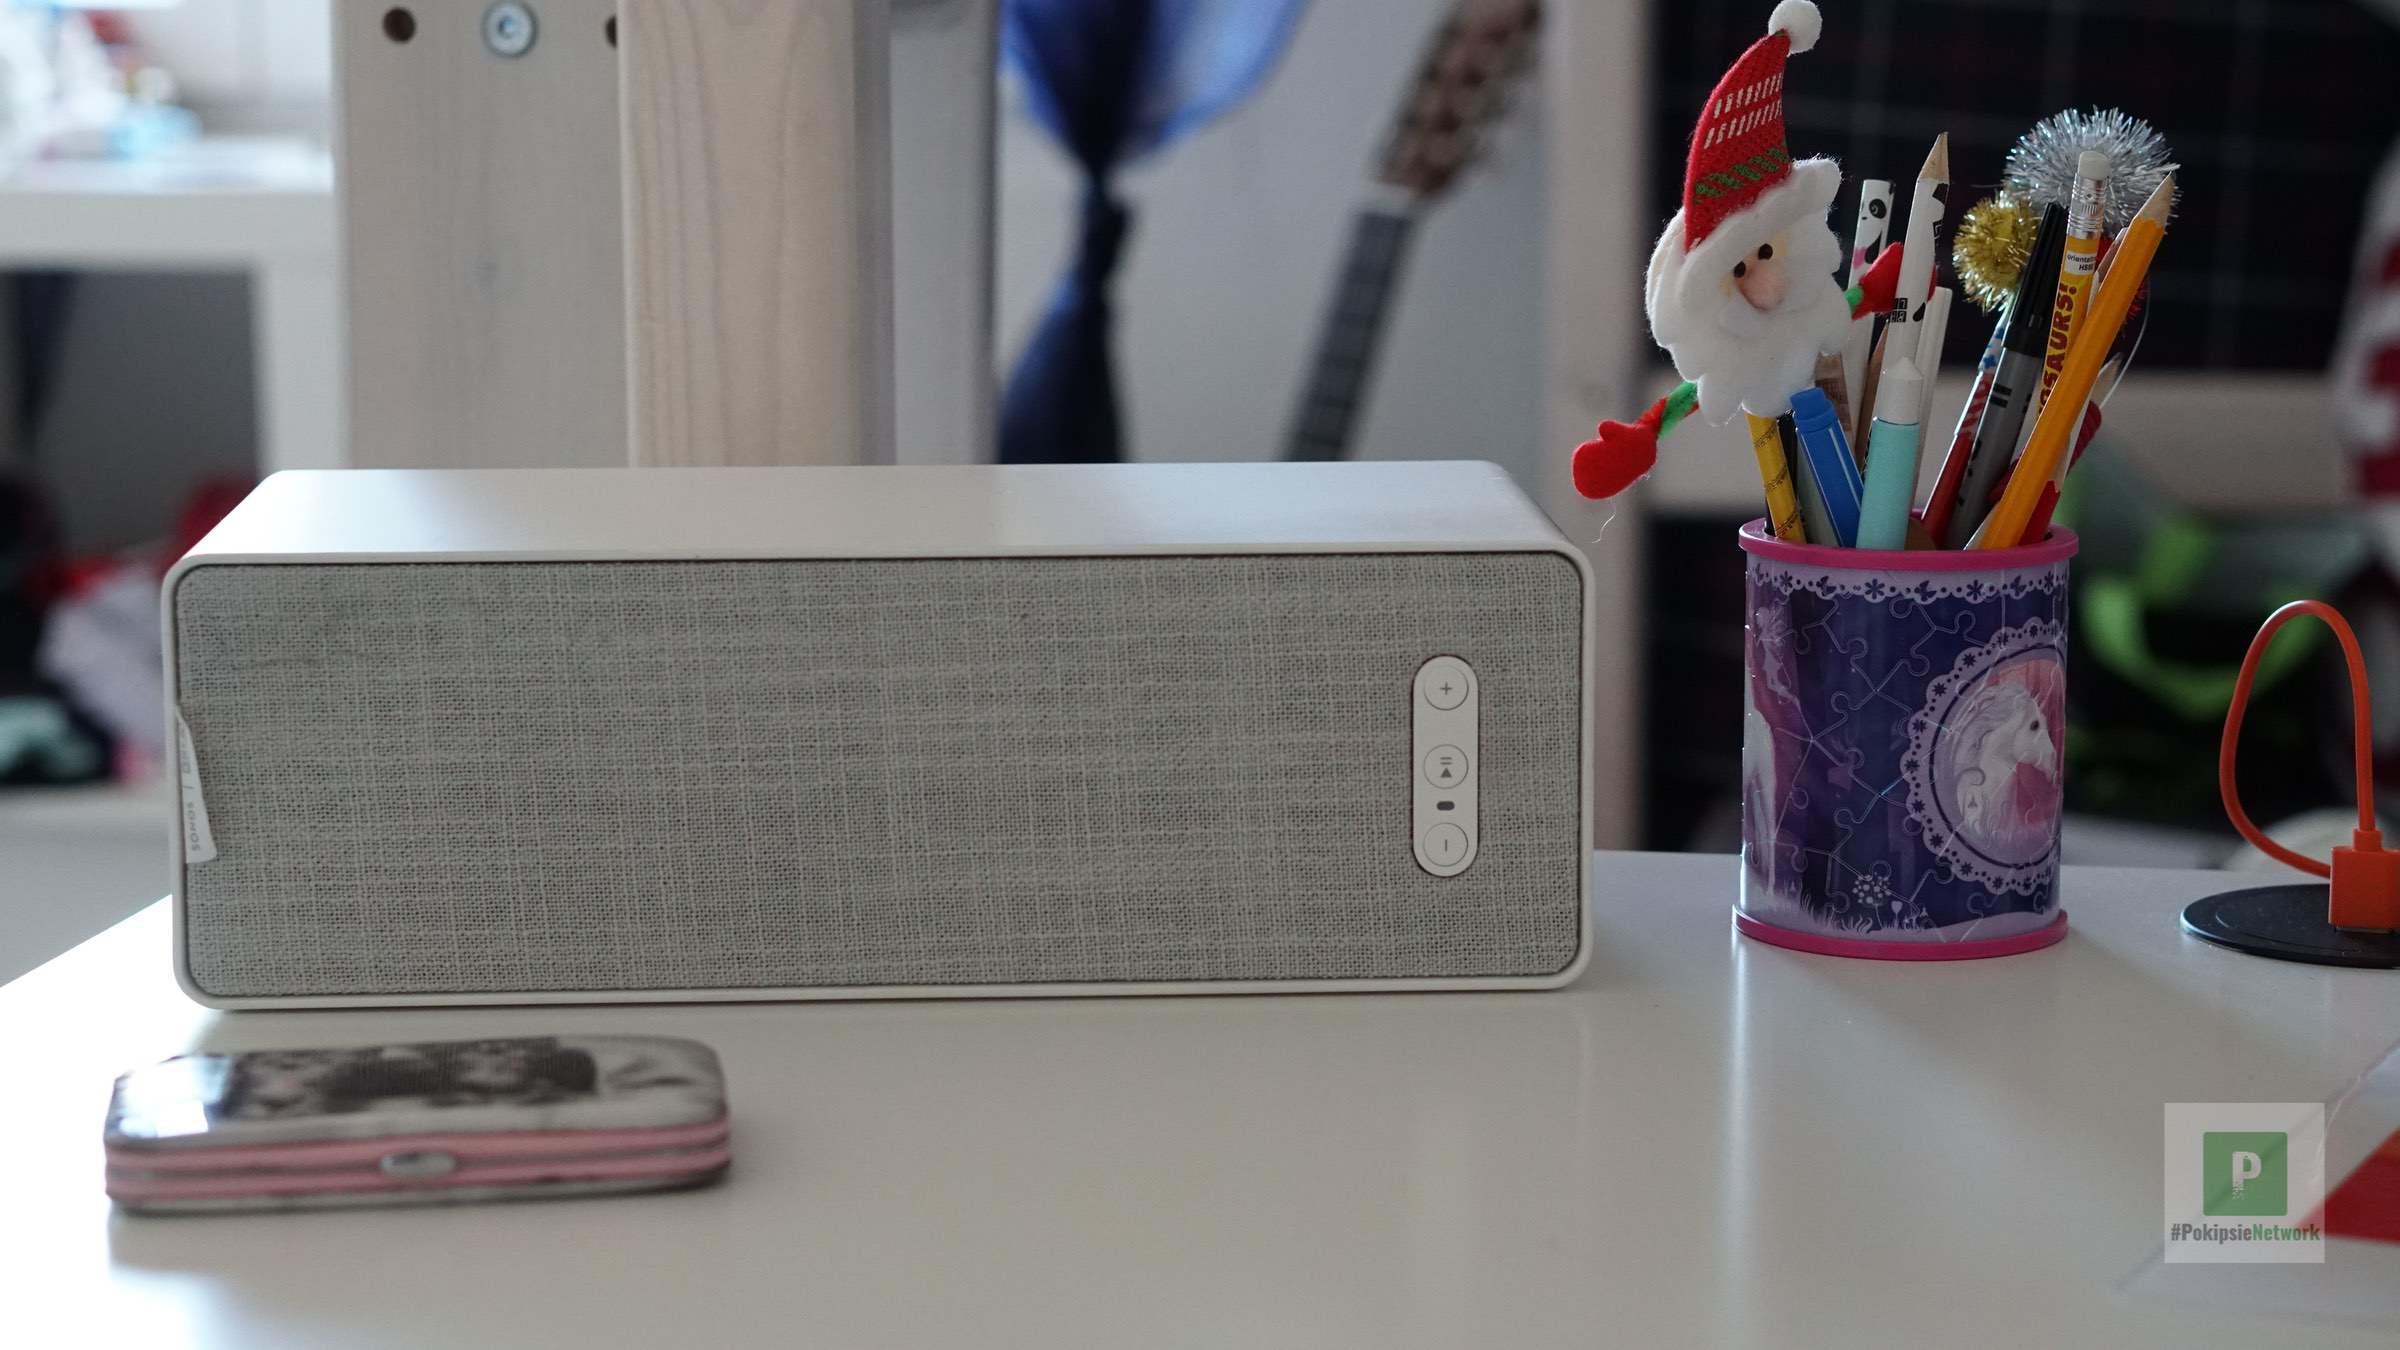 Symfonisk Reset Ikea Sonos Lautsprecher Zurucksetzen Pokipsie Network